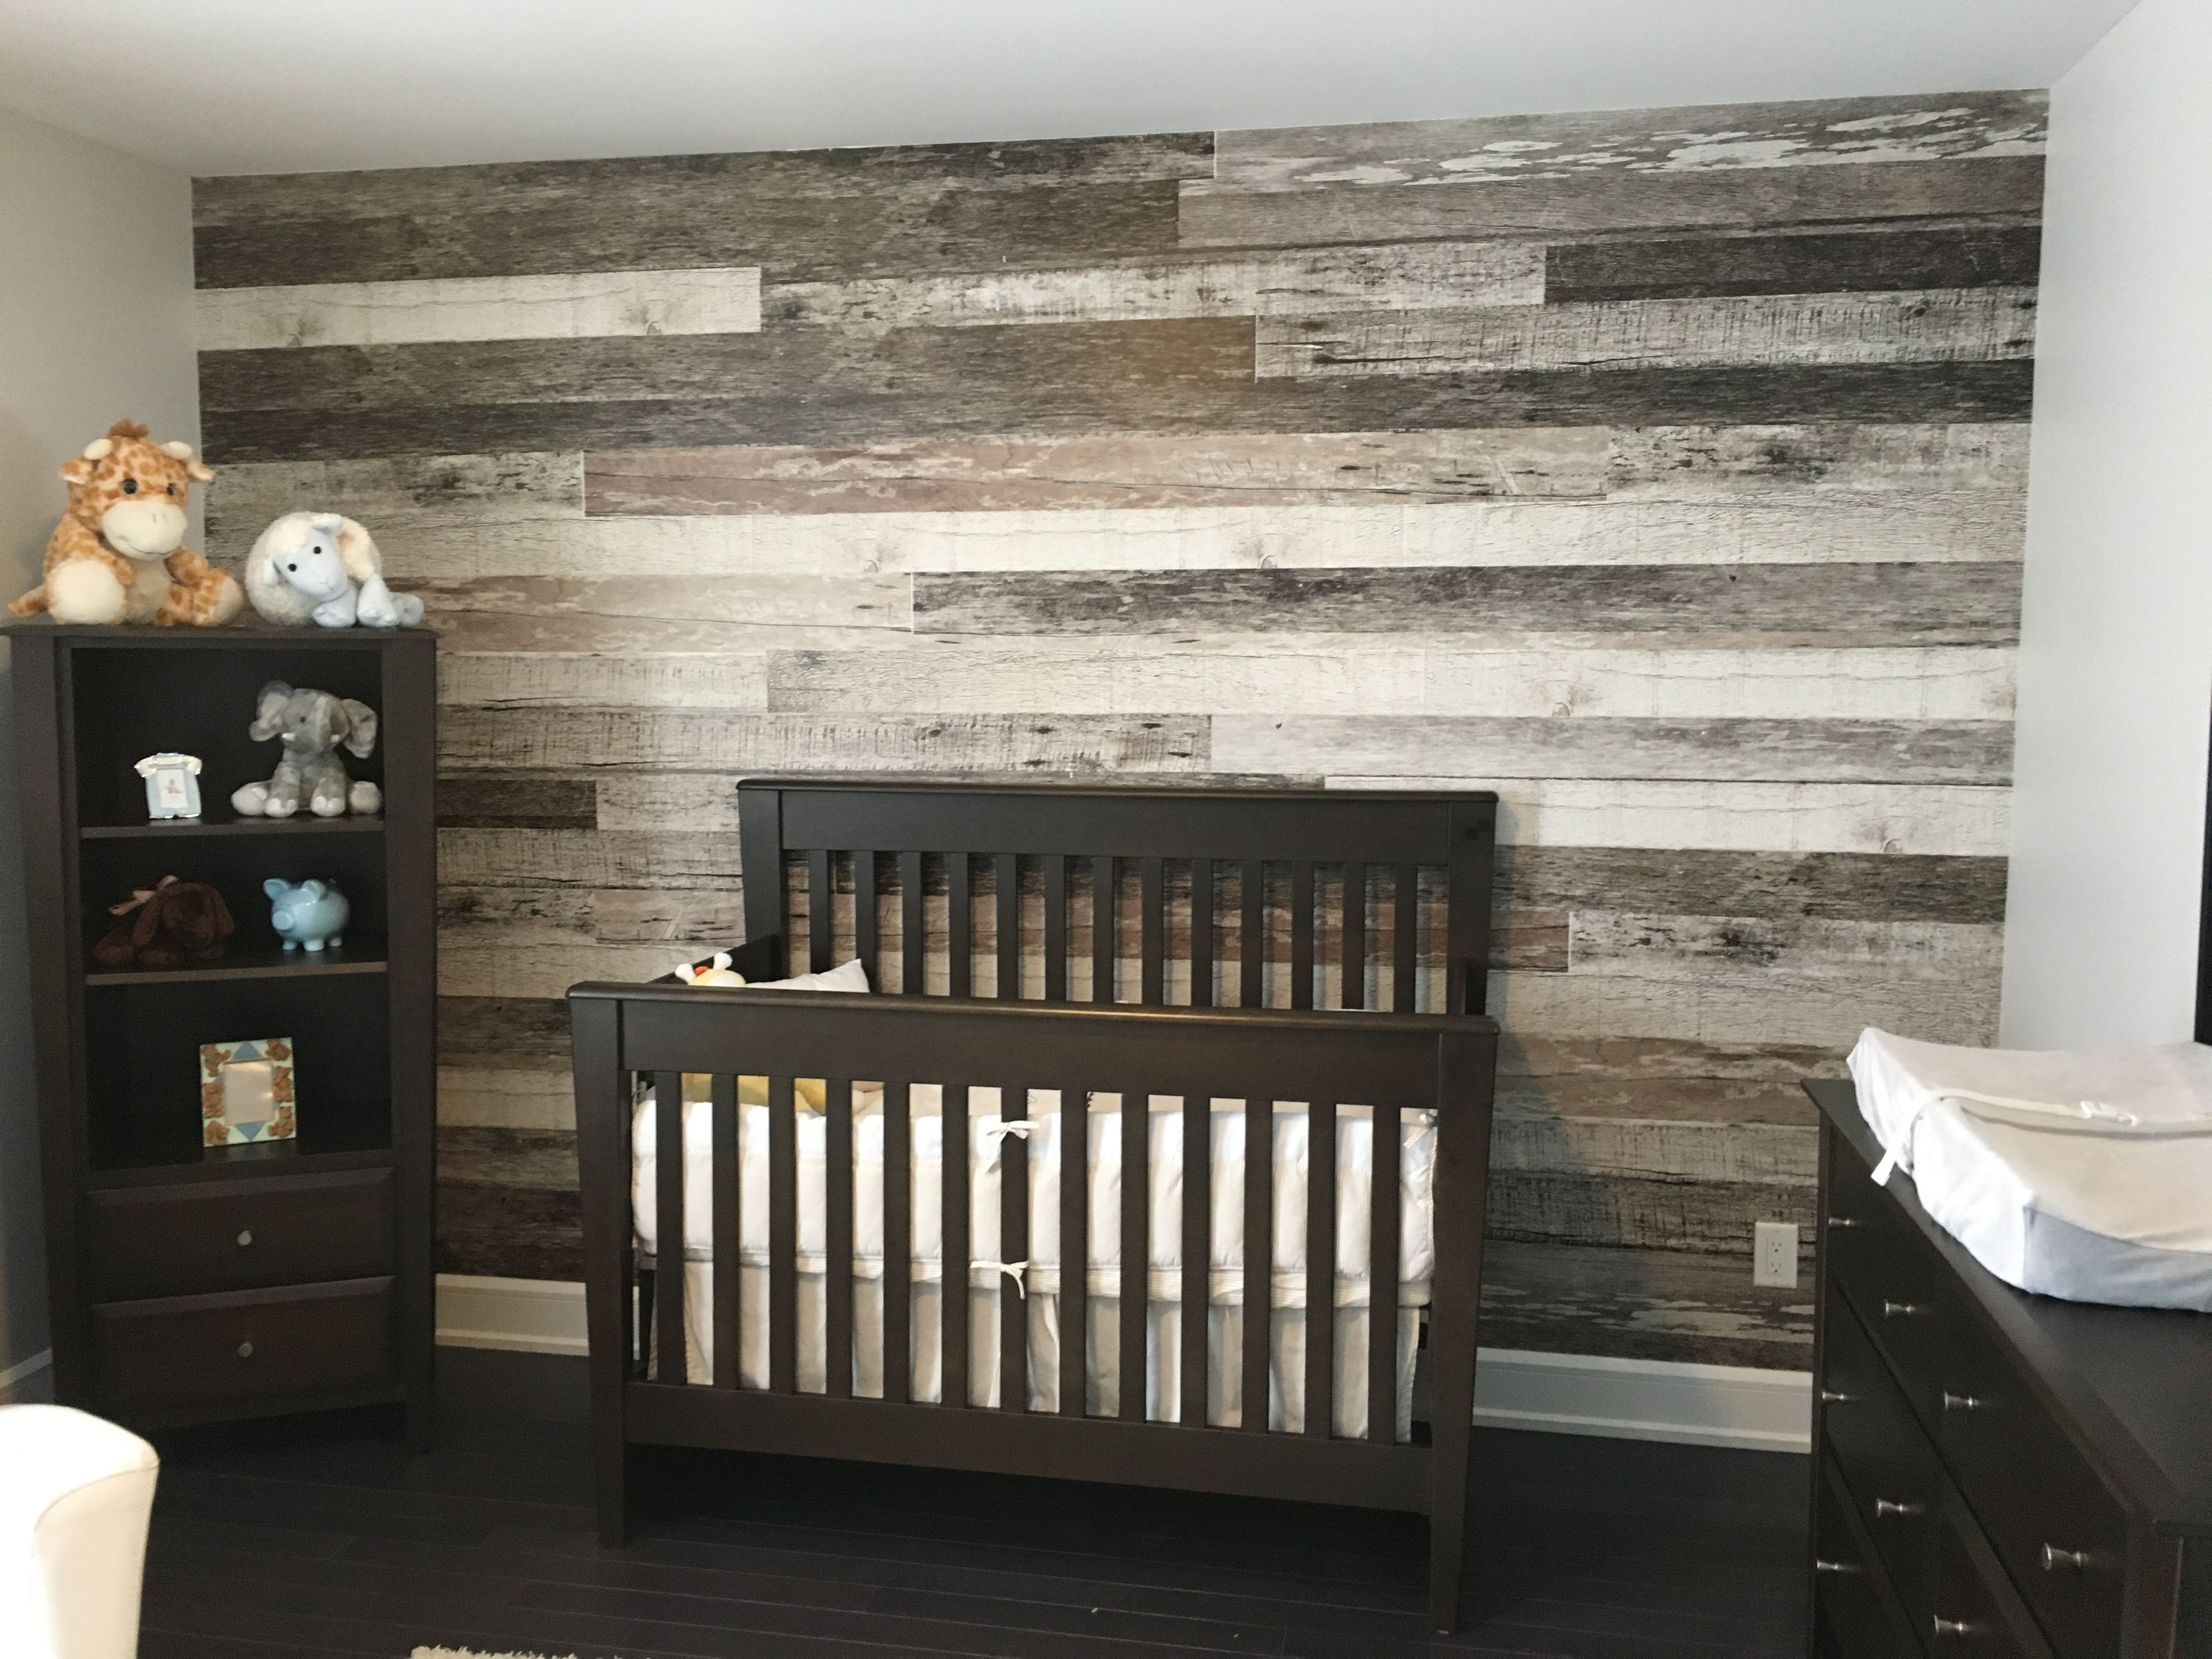 Barn Wood Wallpaper De urale inc Décoration